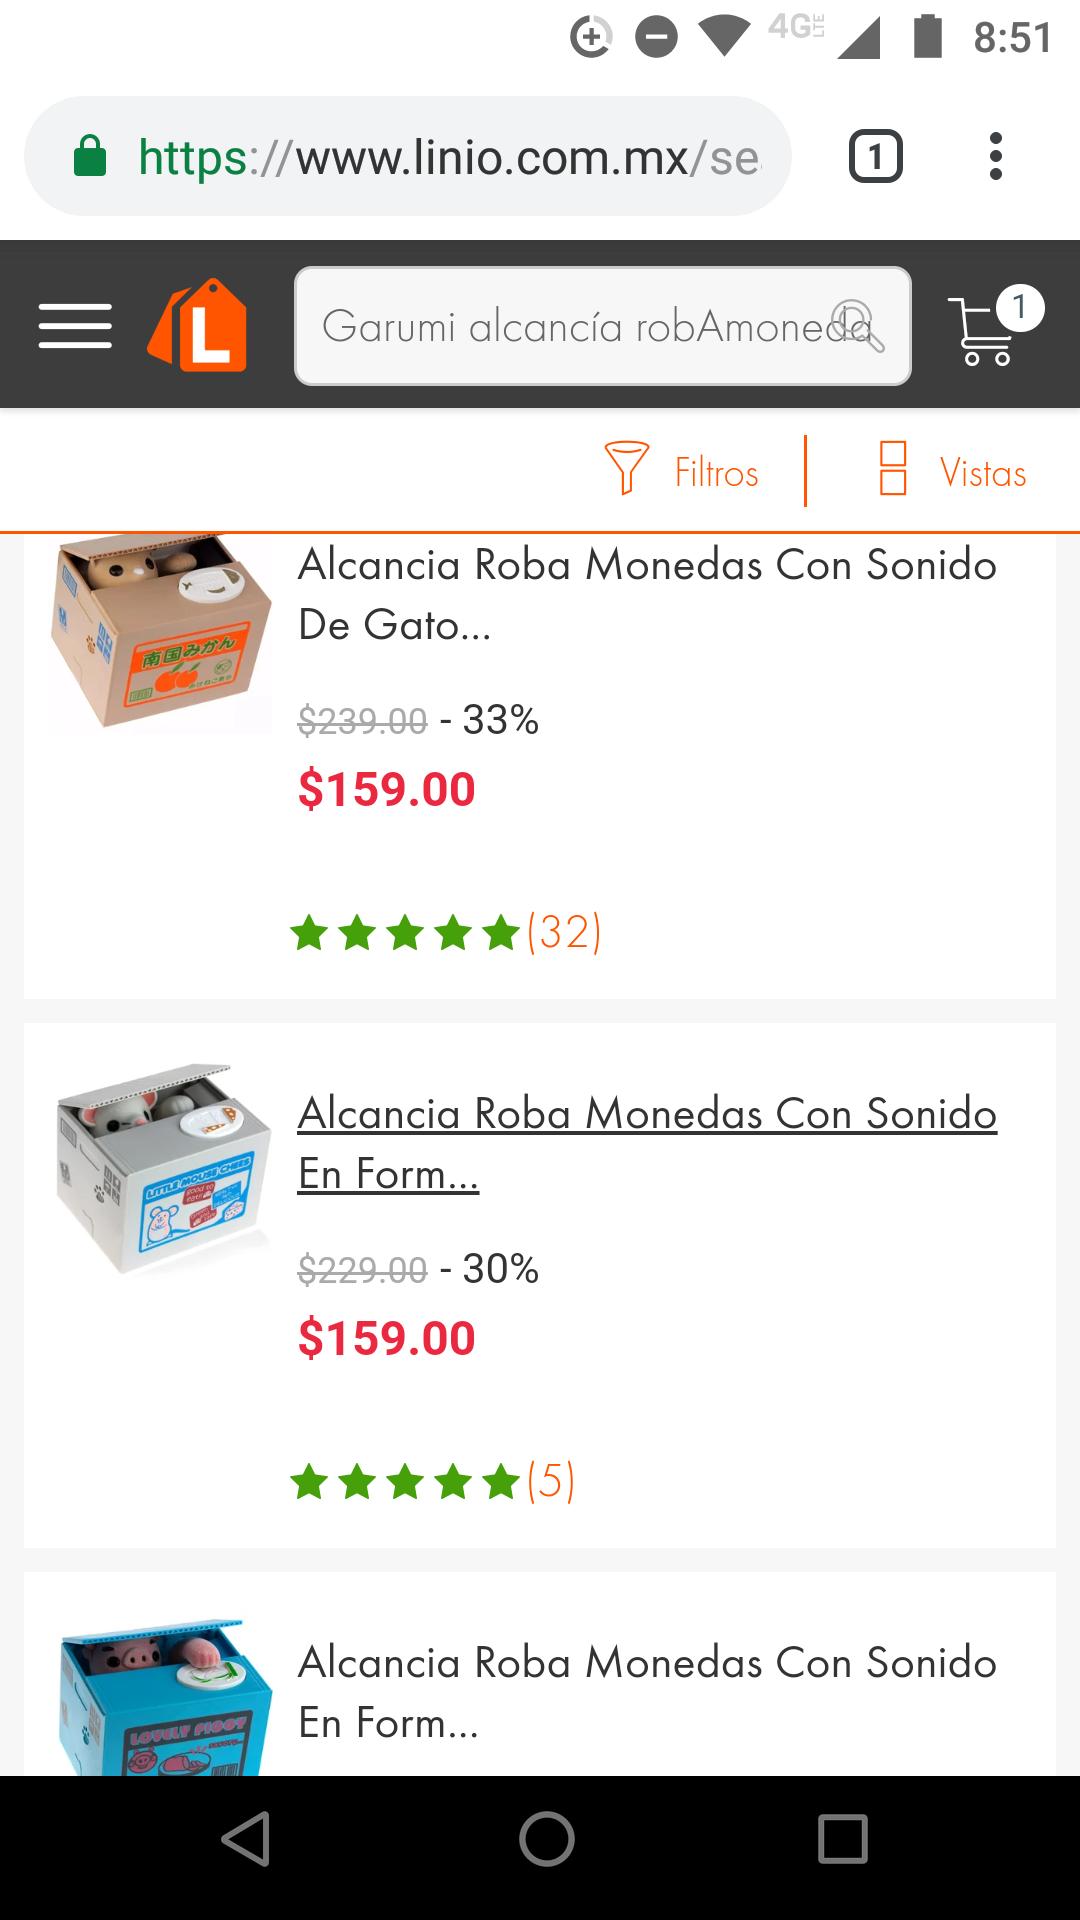 Linio: Varios modelos de alcancias Roba Monedas Con Sonido De Gato